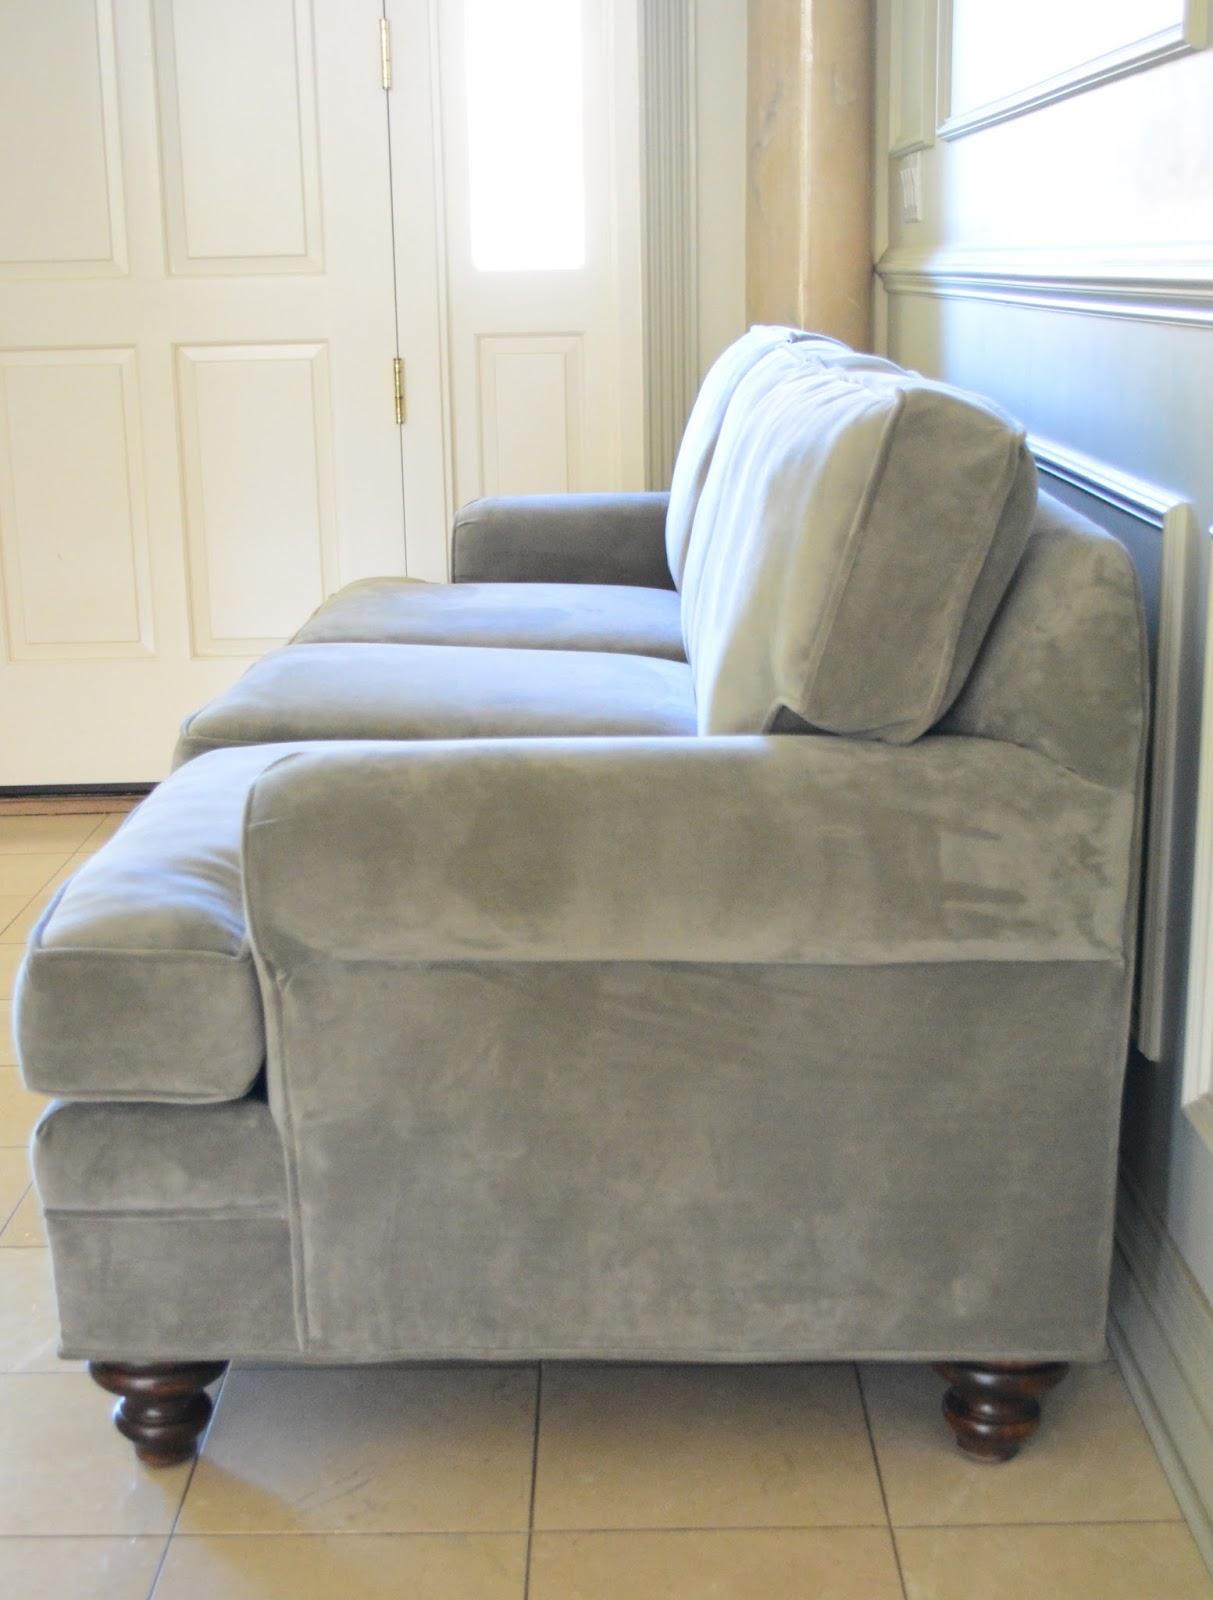 ballard designs sofa manufacturer sofa design sofia sofa ballard designs